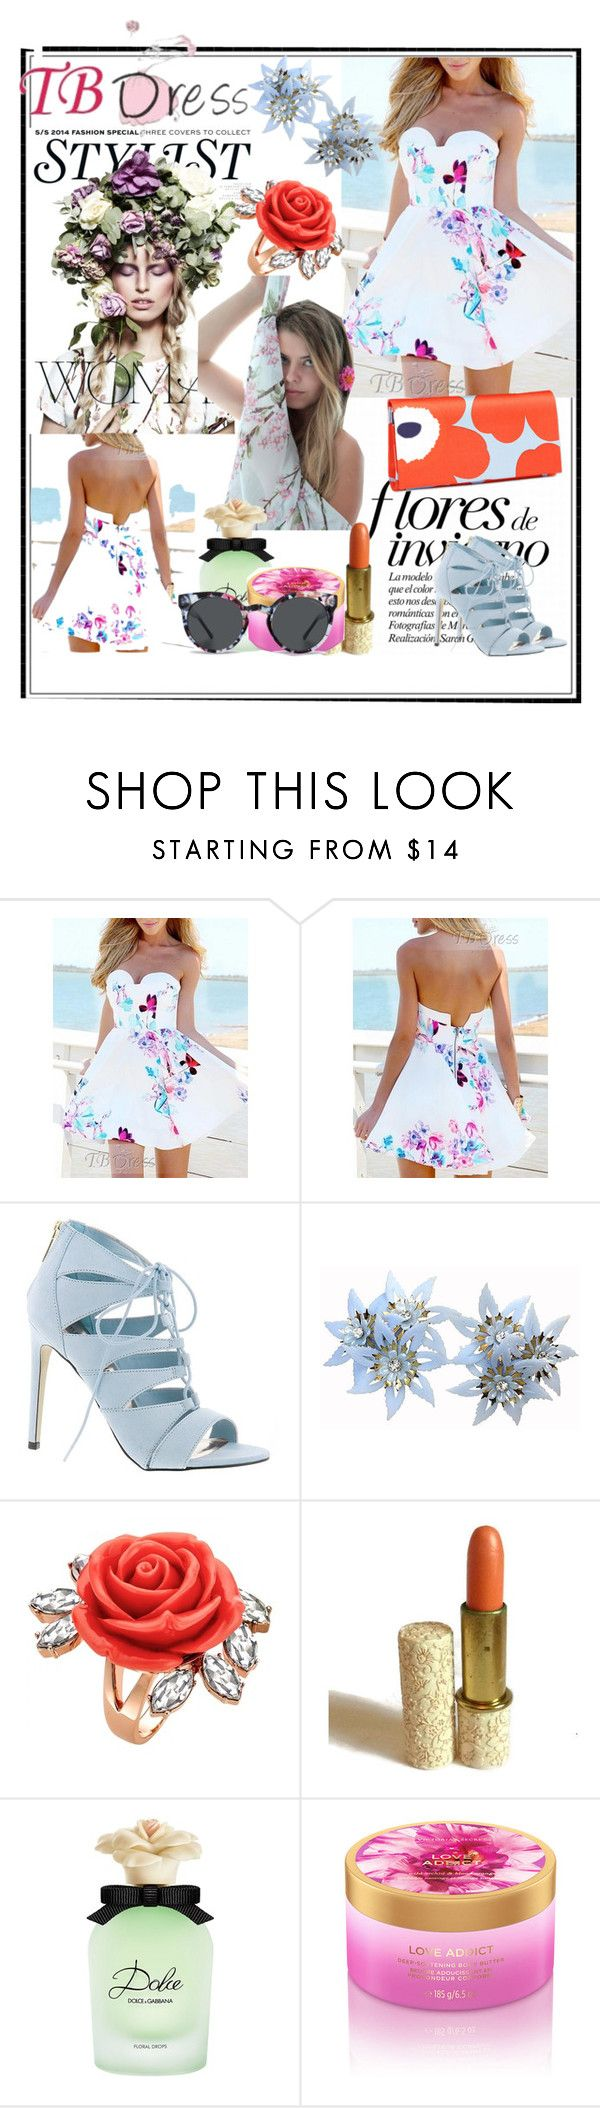 """TB Dress"" by azemina-moda ❤ liked on Polyvore featuring KAROLINA, Madden Girl, Mawi, Avon, Dolce&Gabbana, Komono and tbdress"